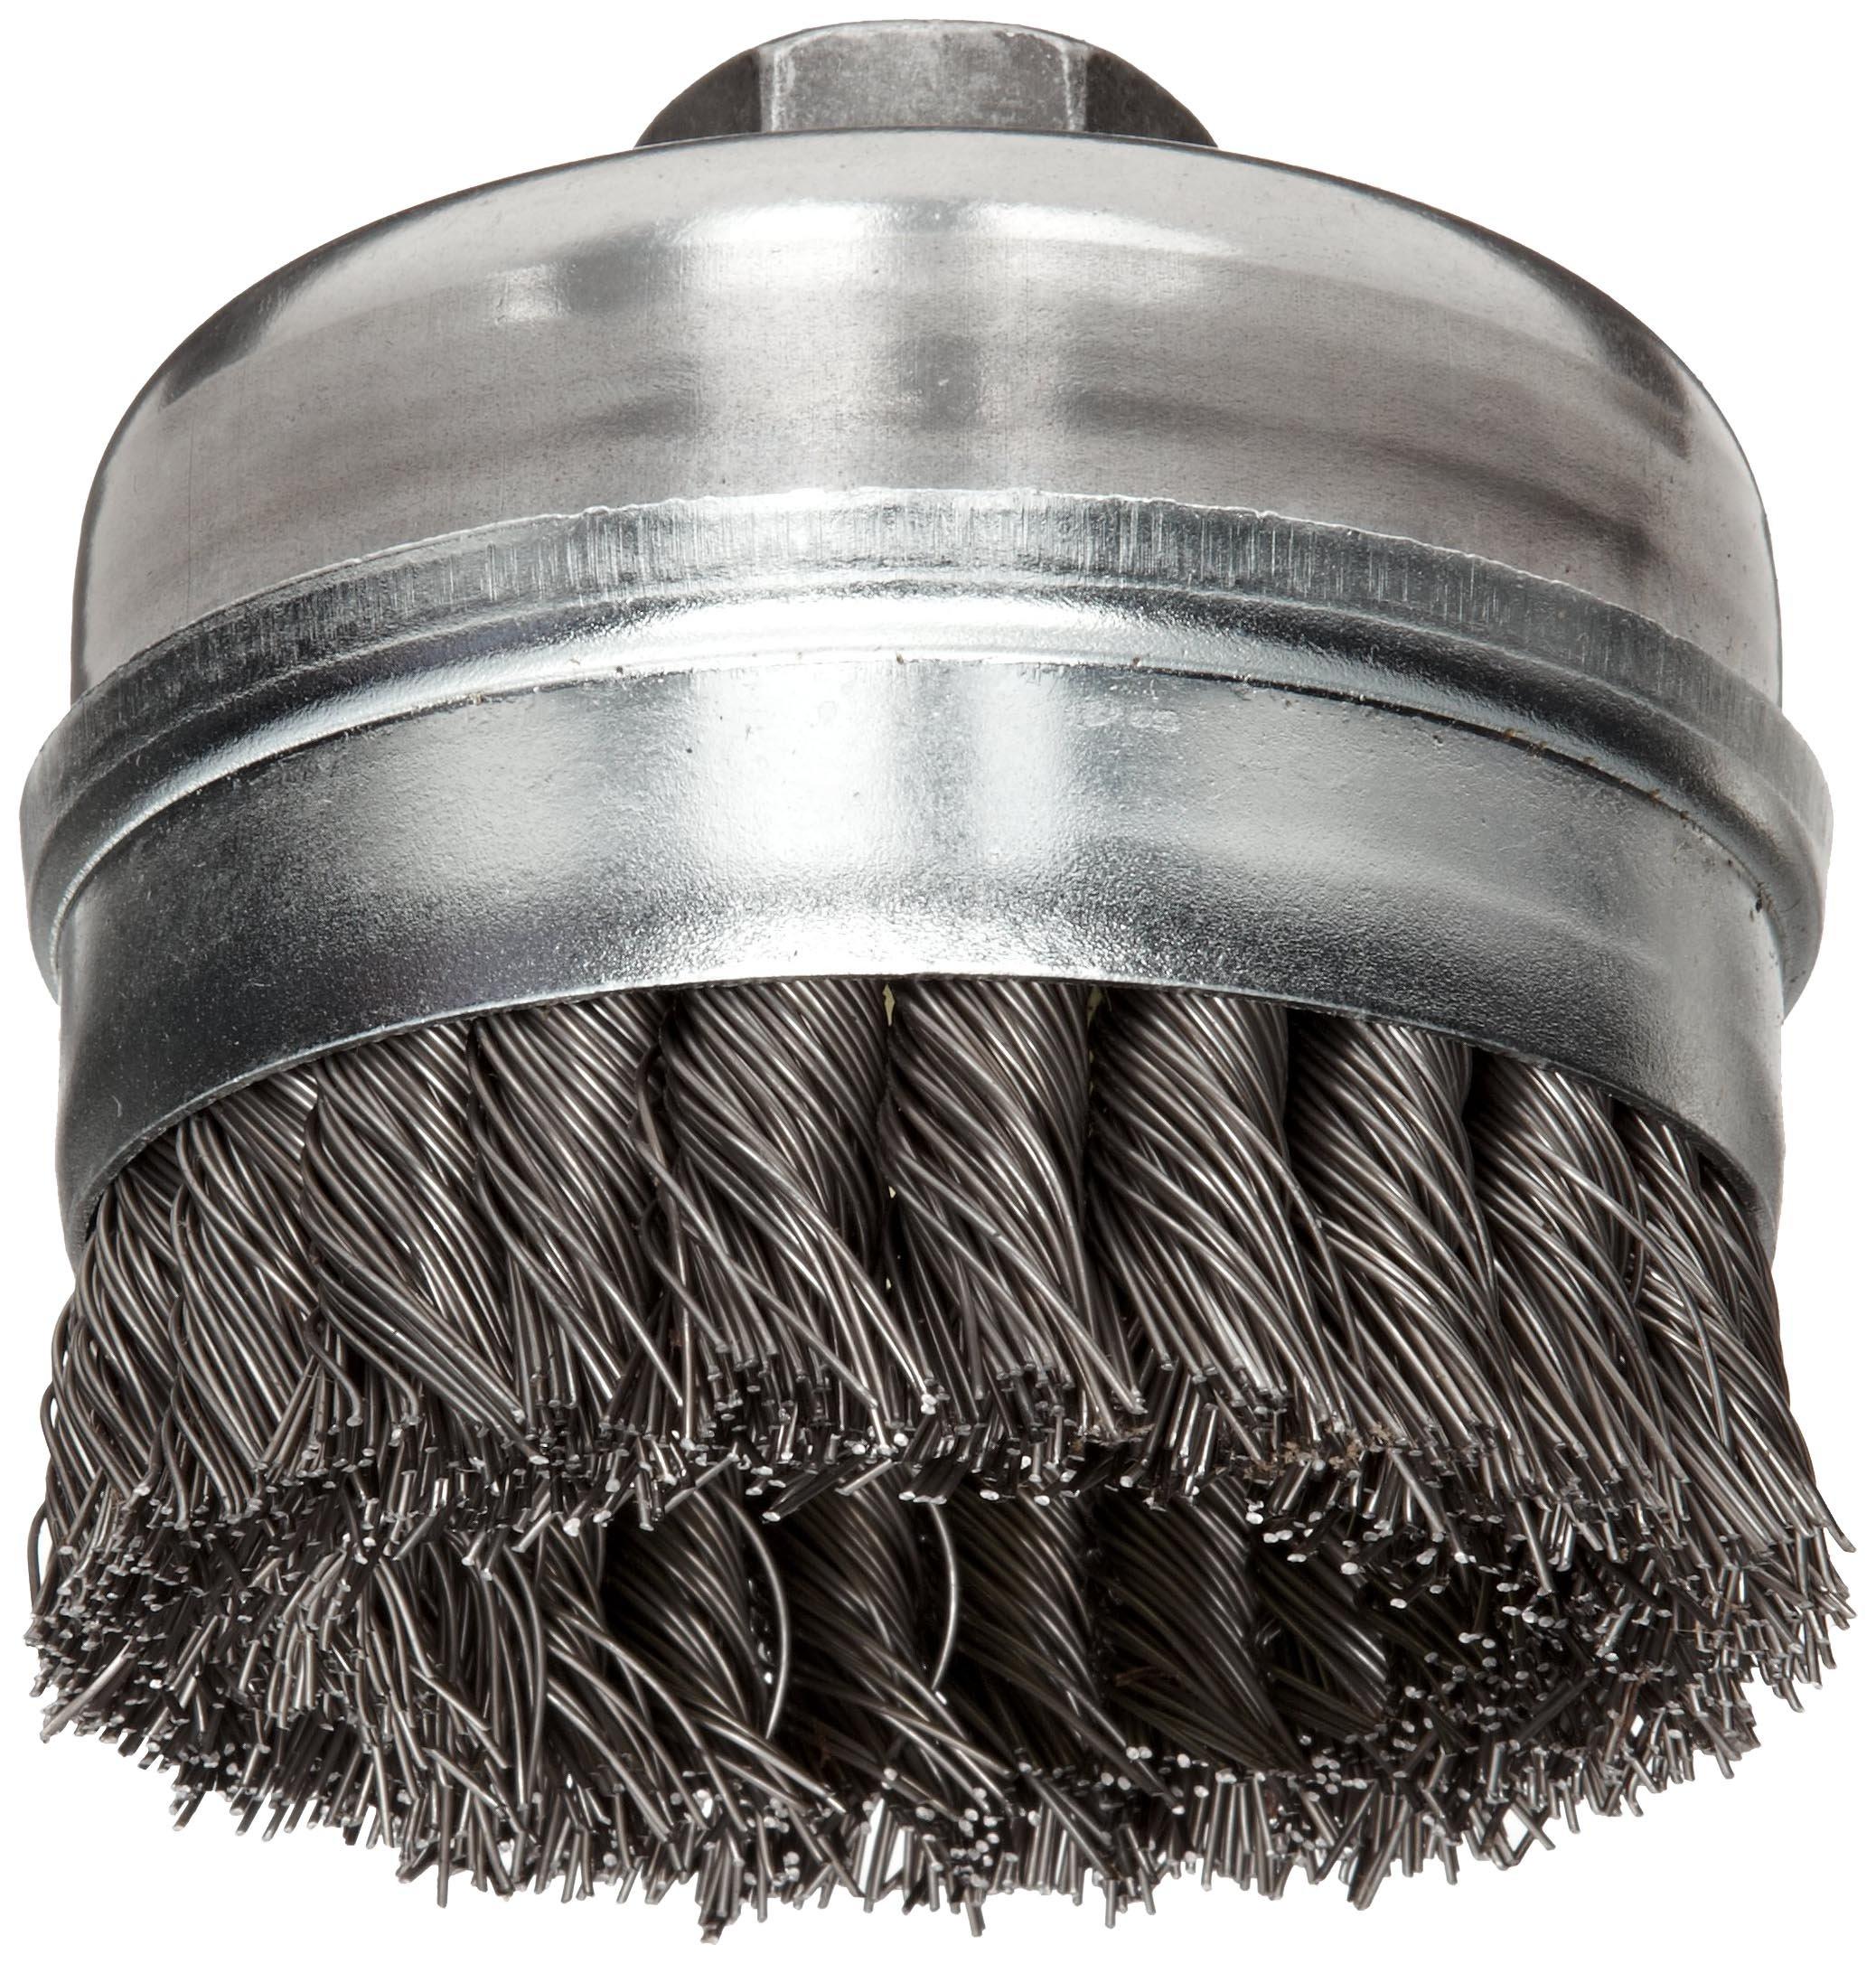 Stainless Steel Stem 3-1//2 Length Weiler 0.006 Wire Size 3//4 Diameter Round Power Tube Brush Steel Bristles